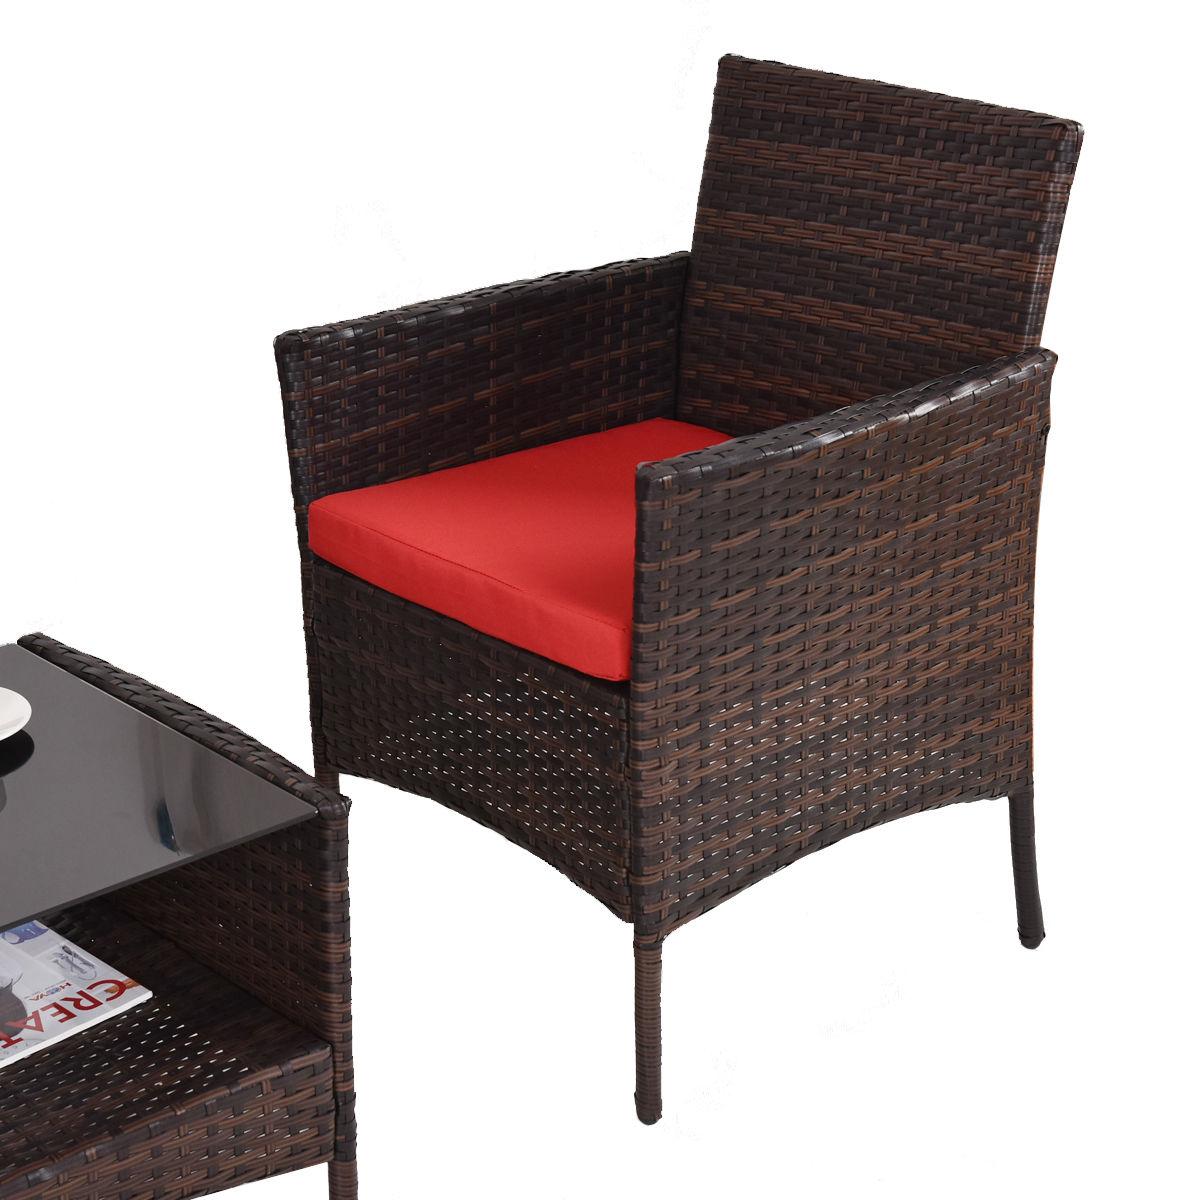 Costway Costway 4 Pcs Outdoor Patio Rattan Furniture Set Table